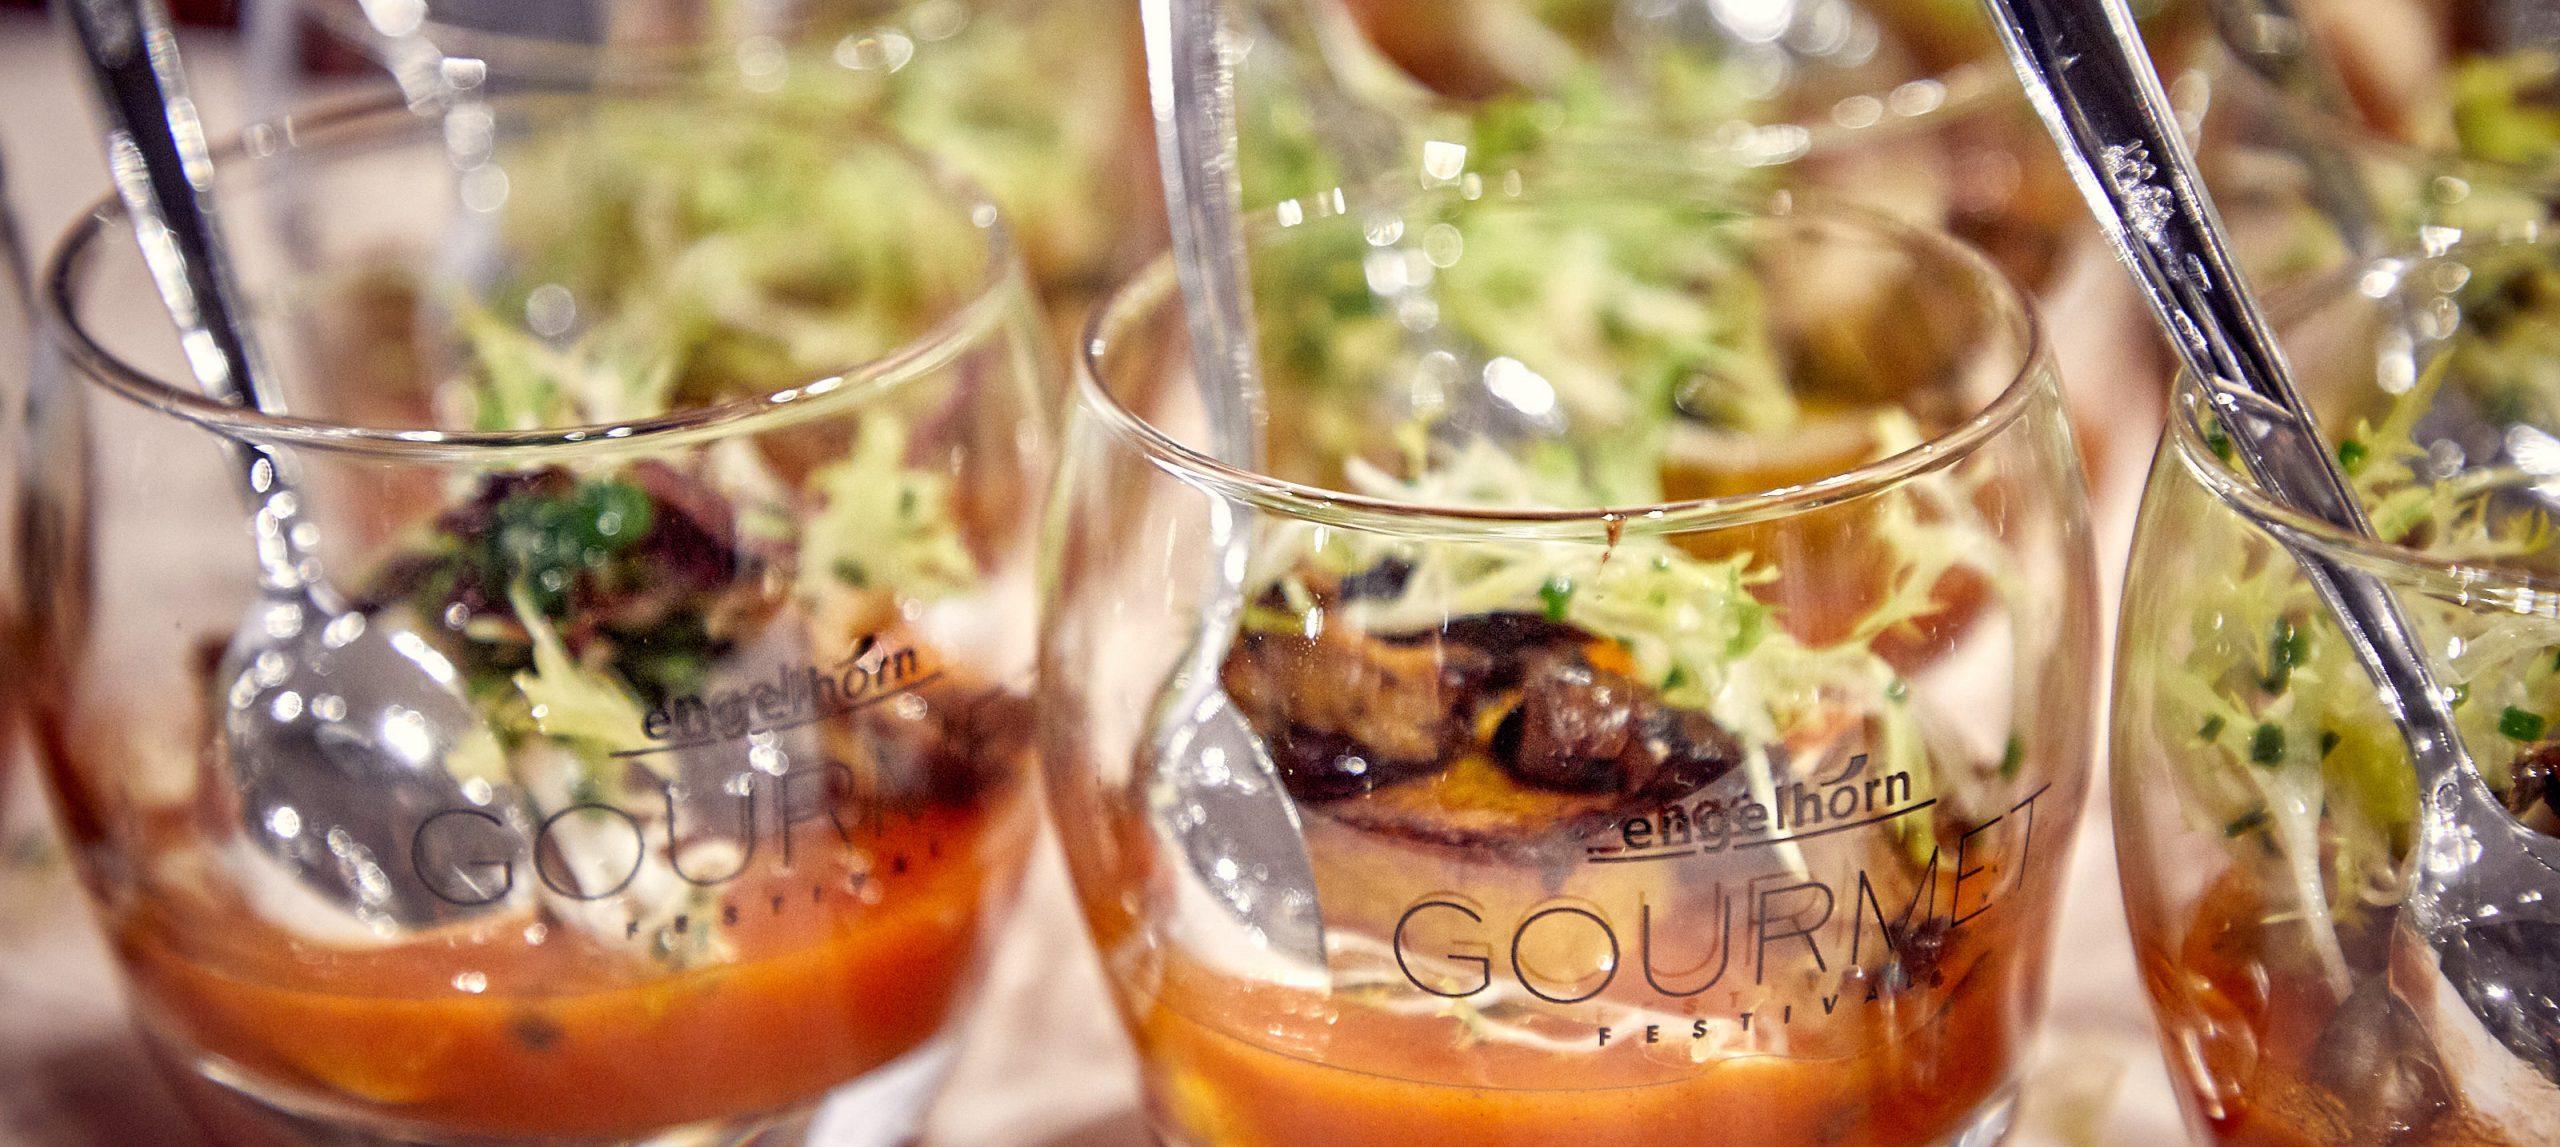 Impressionen engelhorn Gourmetfestival 2018